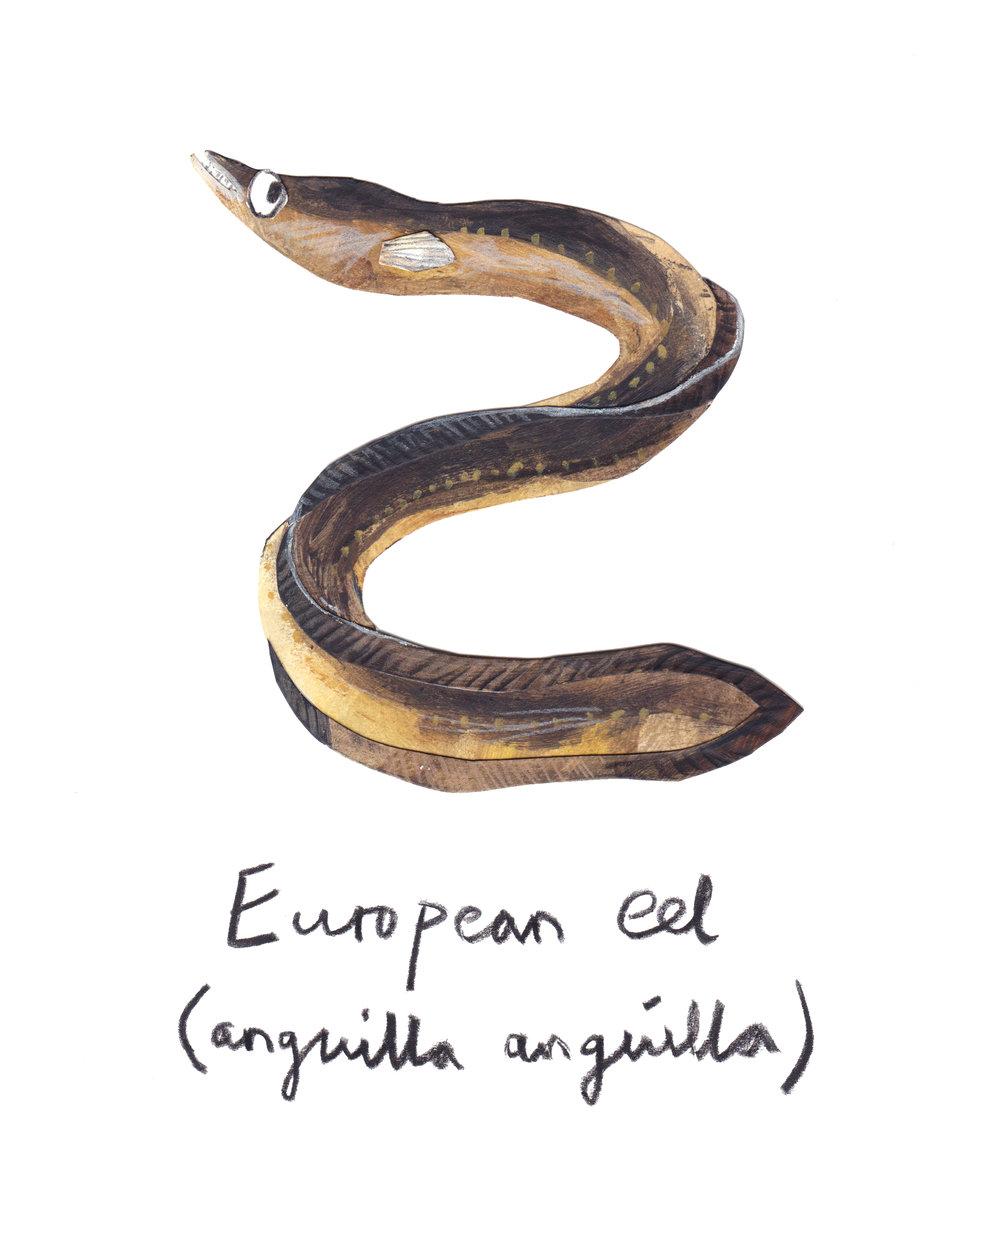 European Eel adult